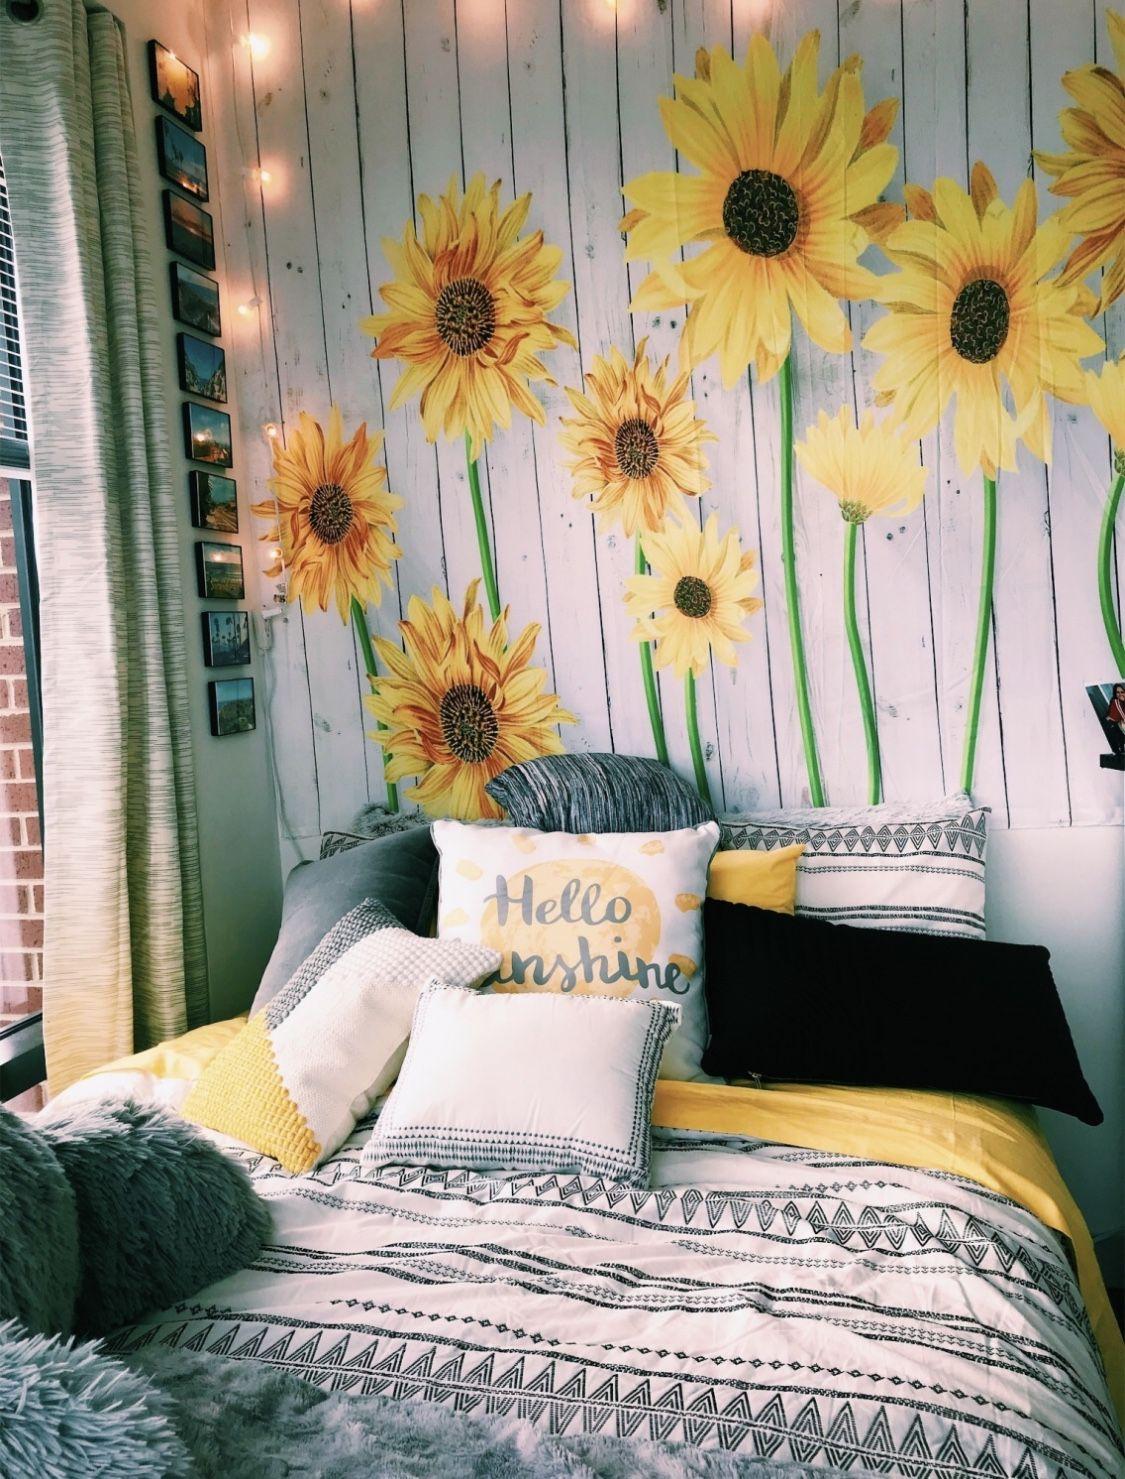 Pinterest Carolinefaith417★ Aesthetic Rooms Sunflower Room Cute Bedroom Ideas